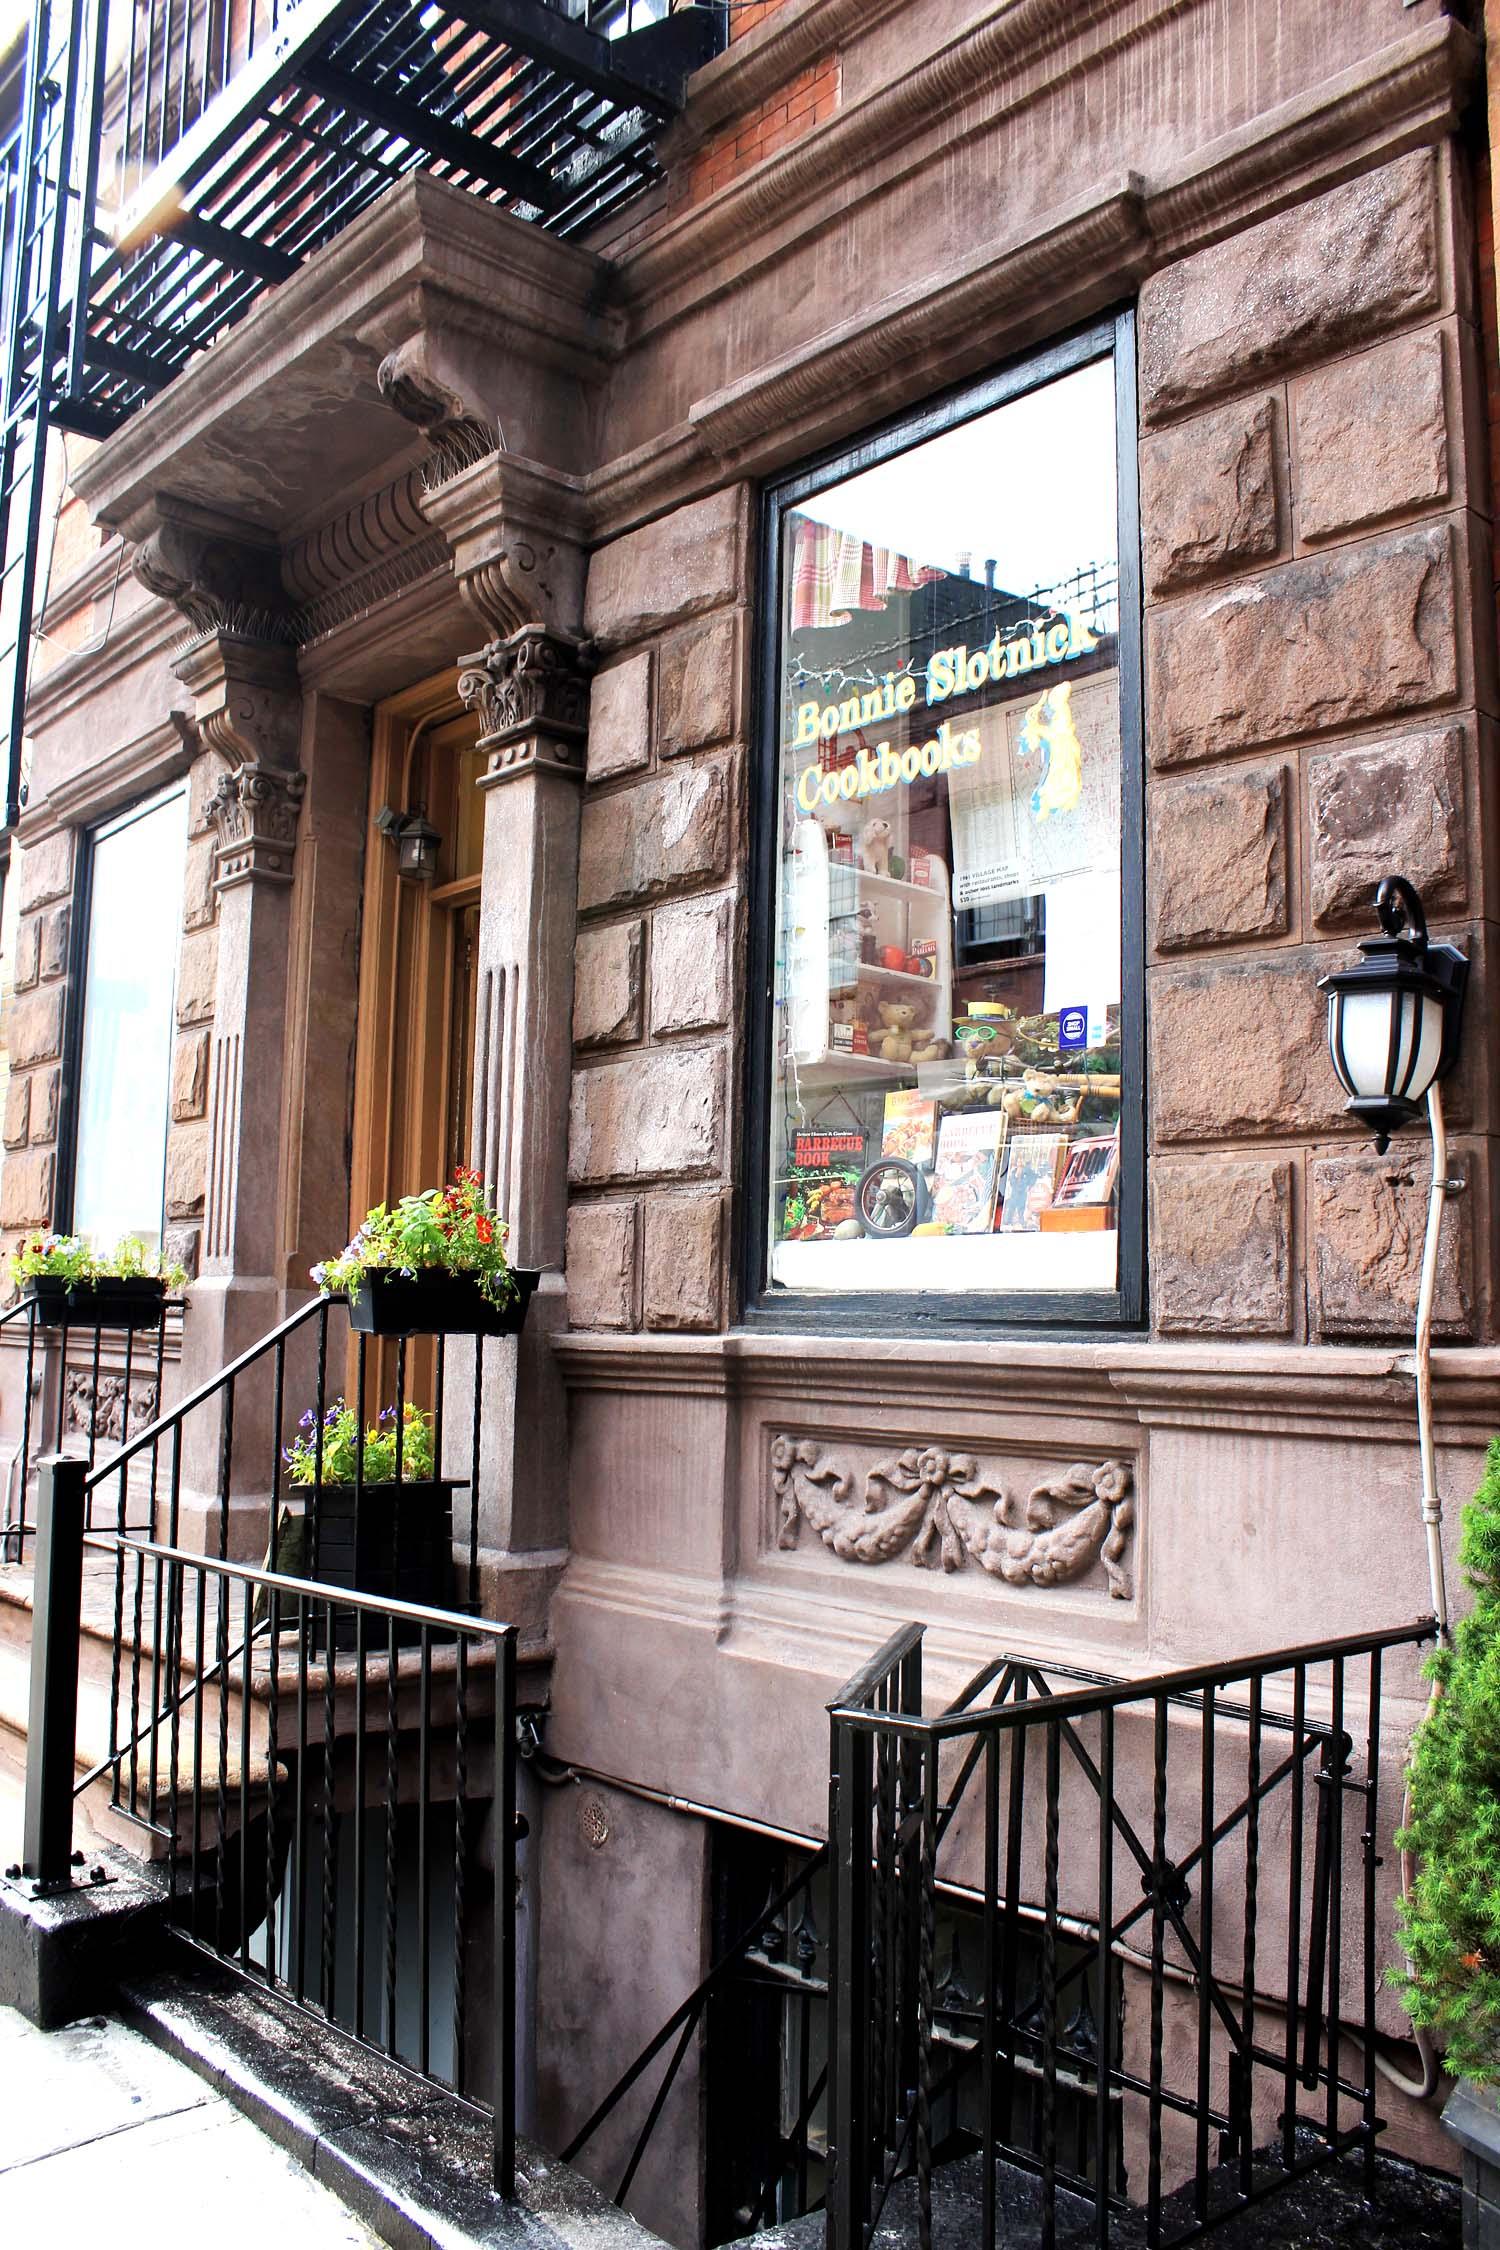 Bonnie Slotnick Cookbooks, Greenwich Village | Image: Laura Messersmith